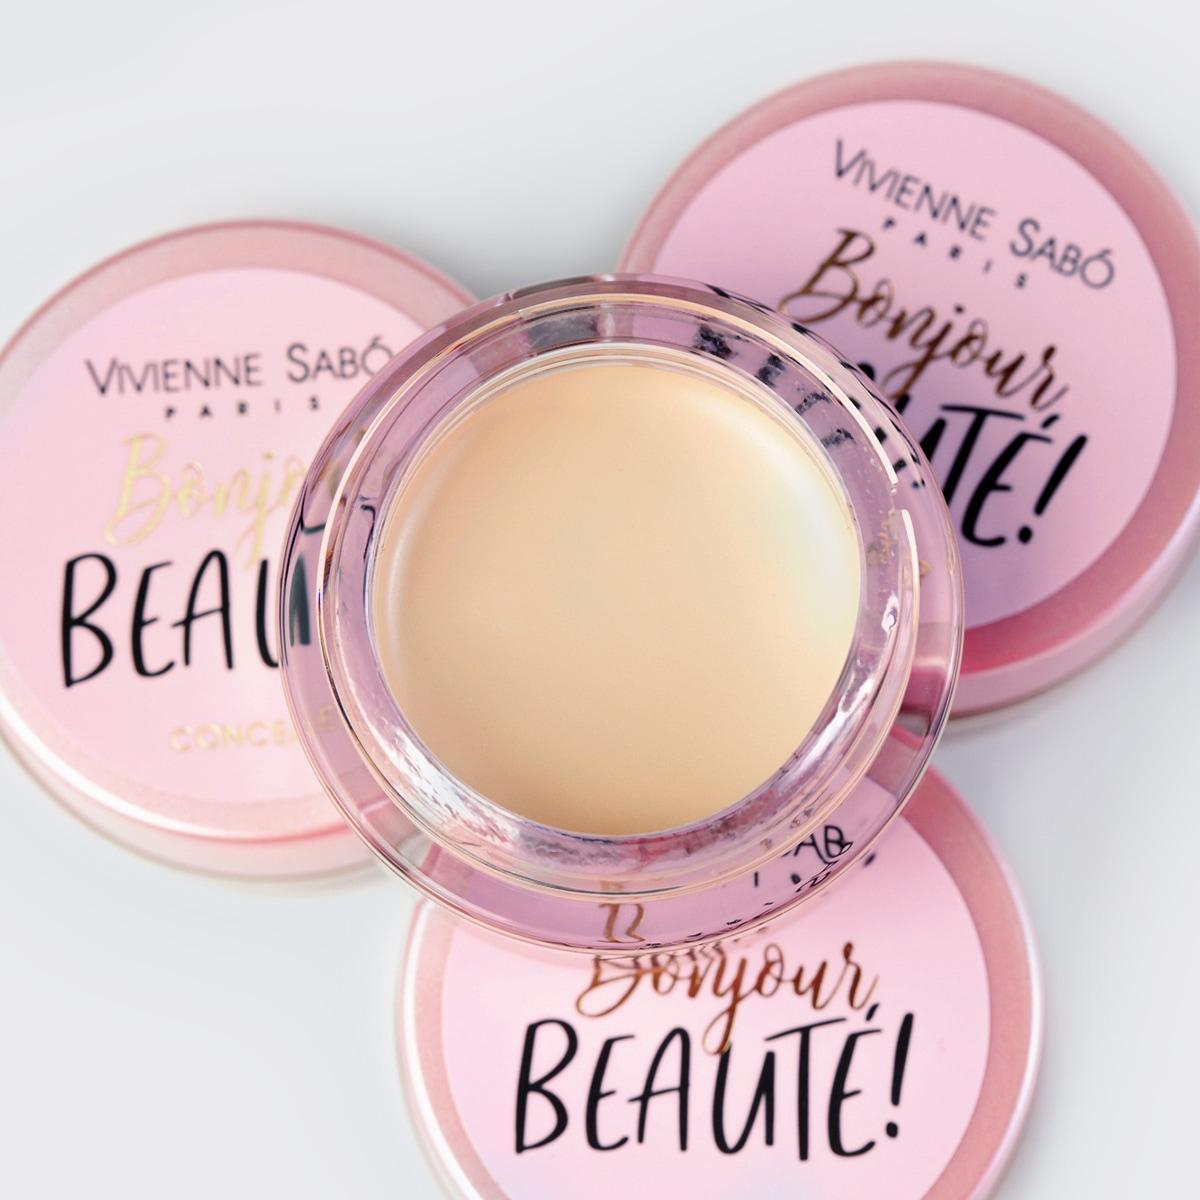 Vivienne Sabo - Concealer Bounjour Beaute 01 - Light Beige